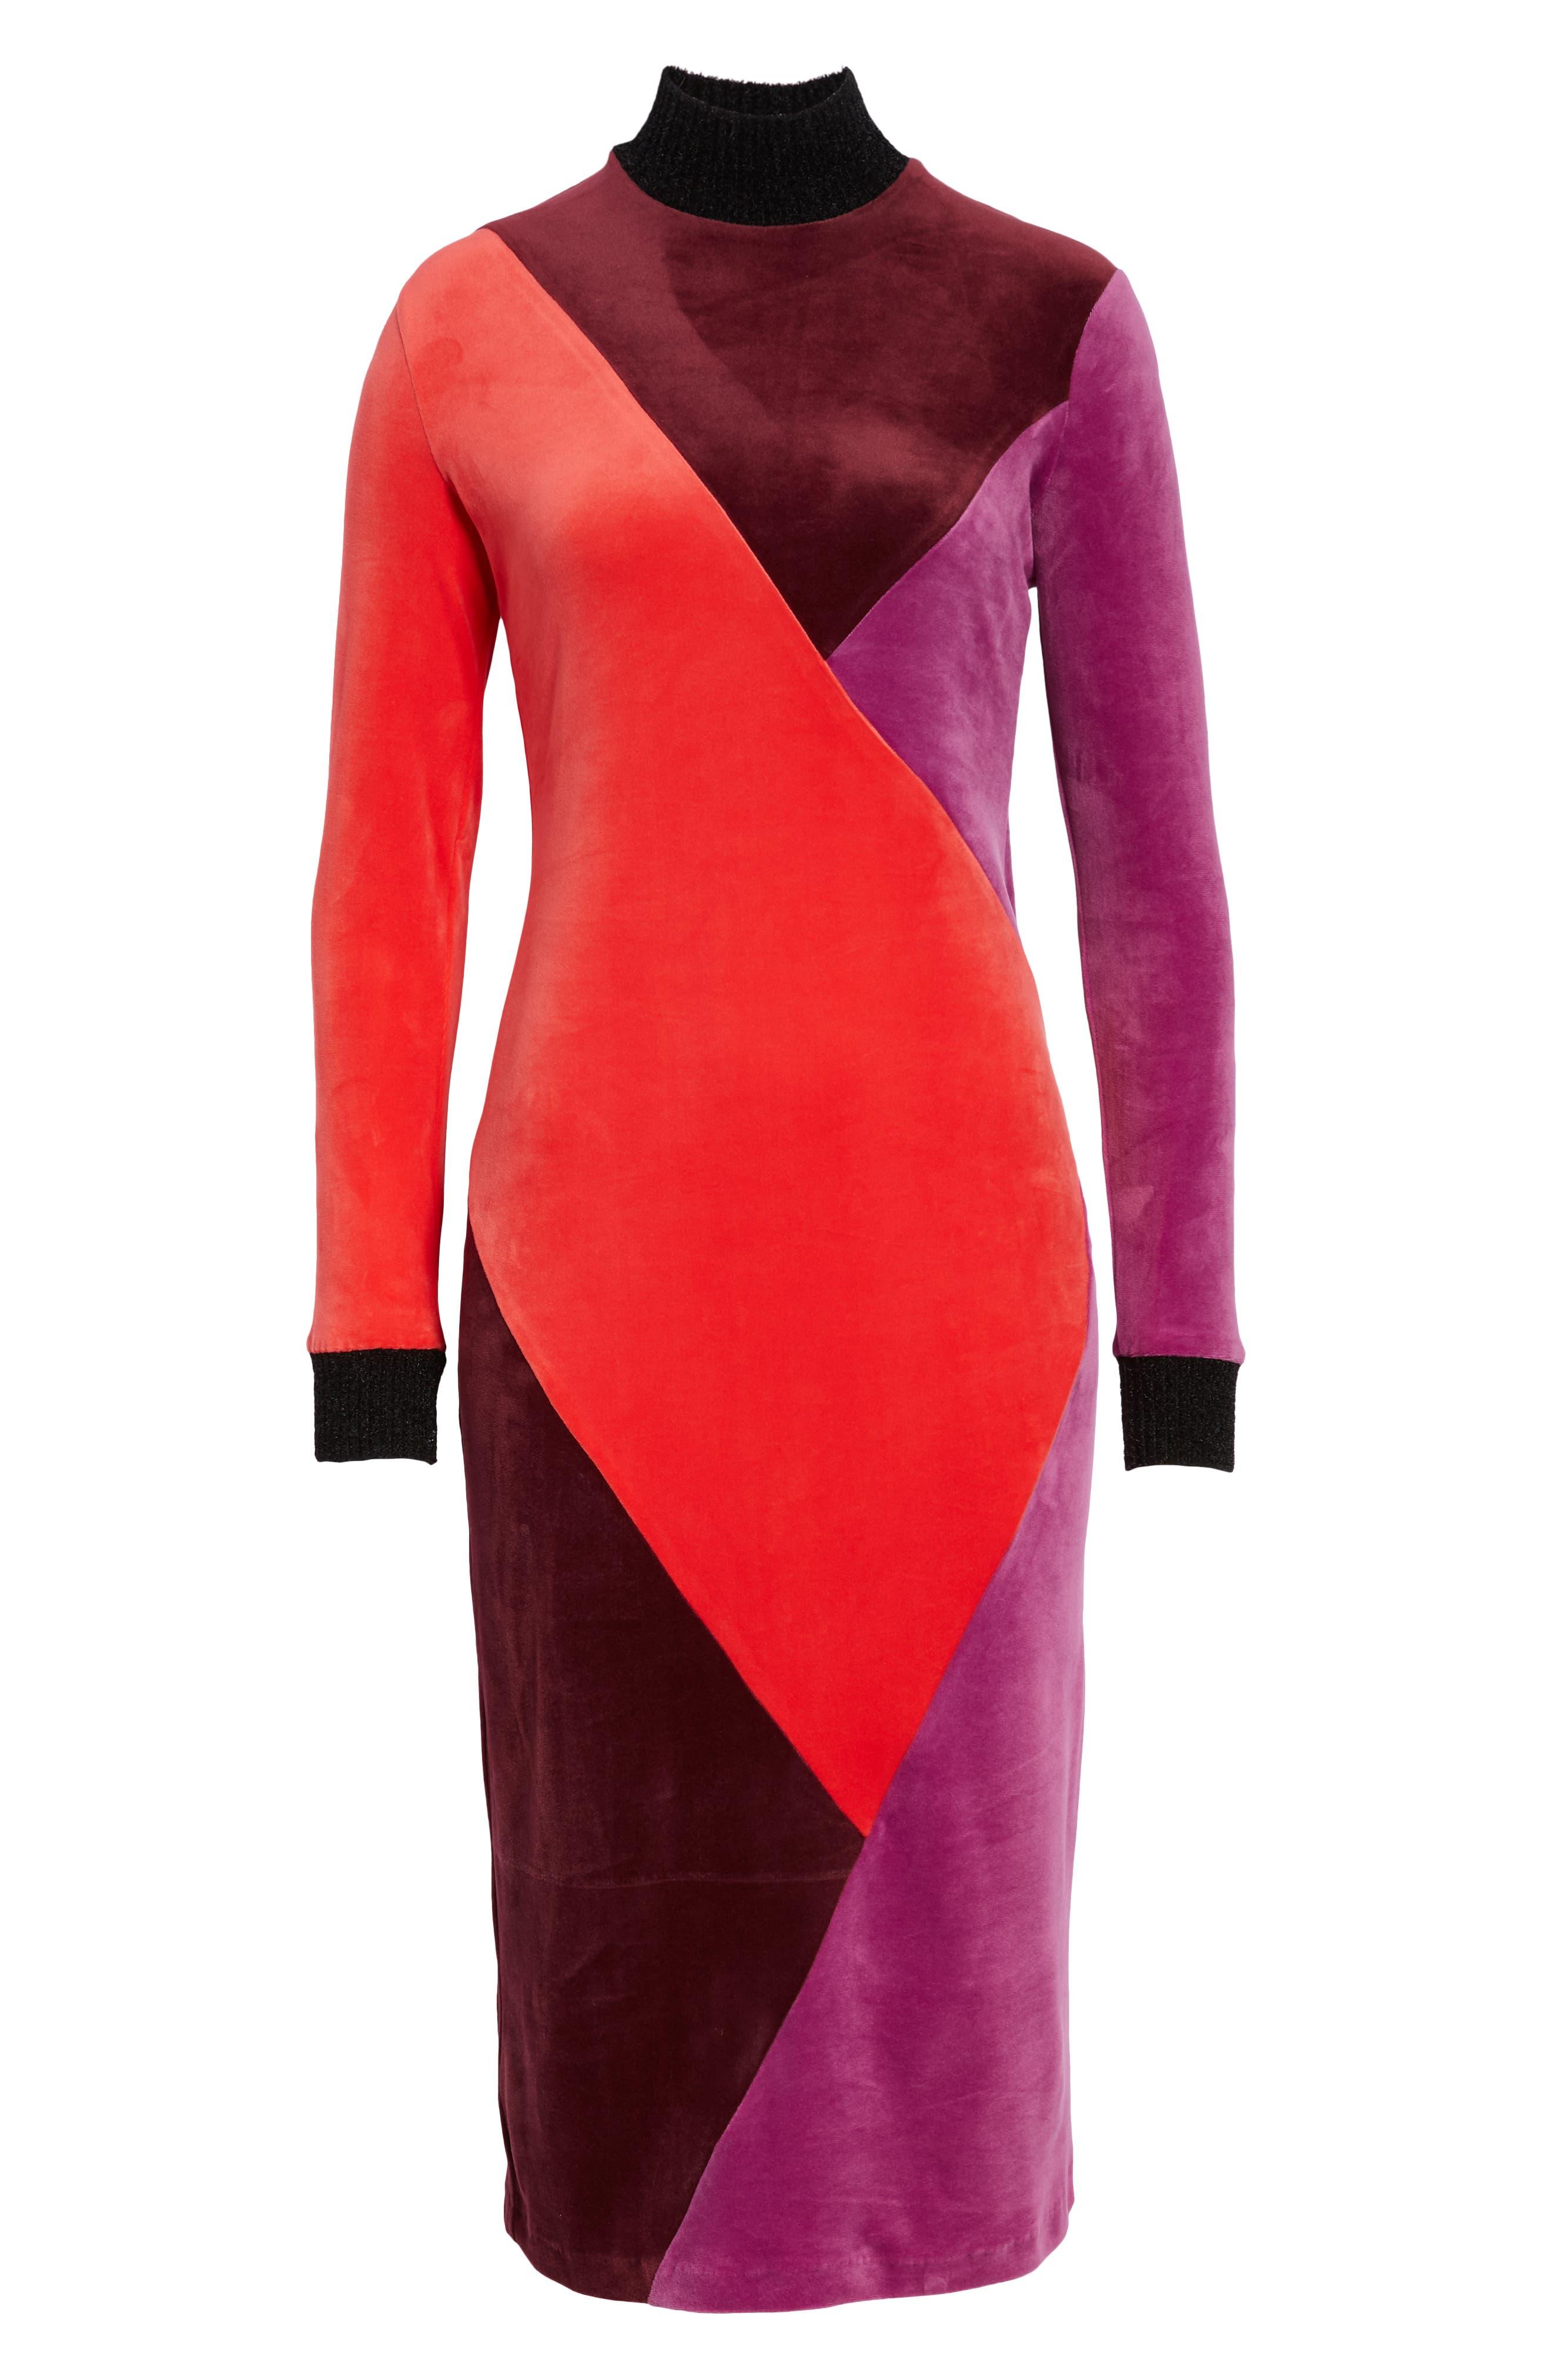 Velluto Velour Midi Dress,                             Alternate thumbnail 7, color,                             BORGOGNA